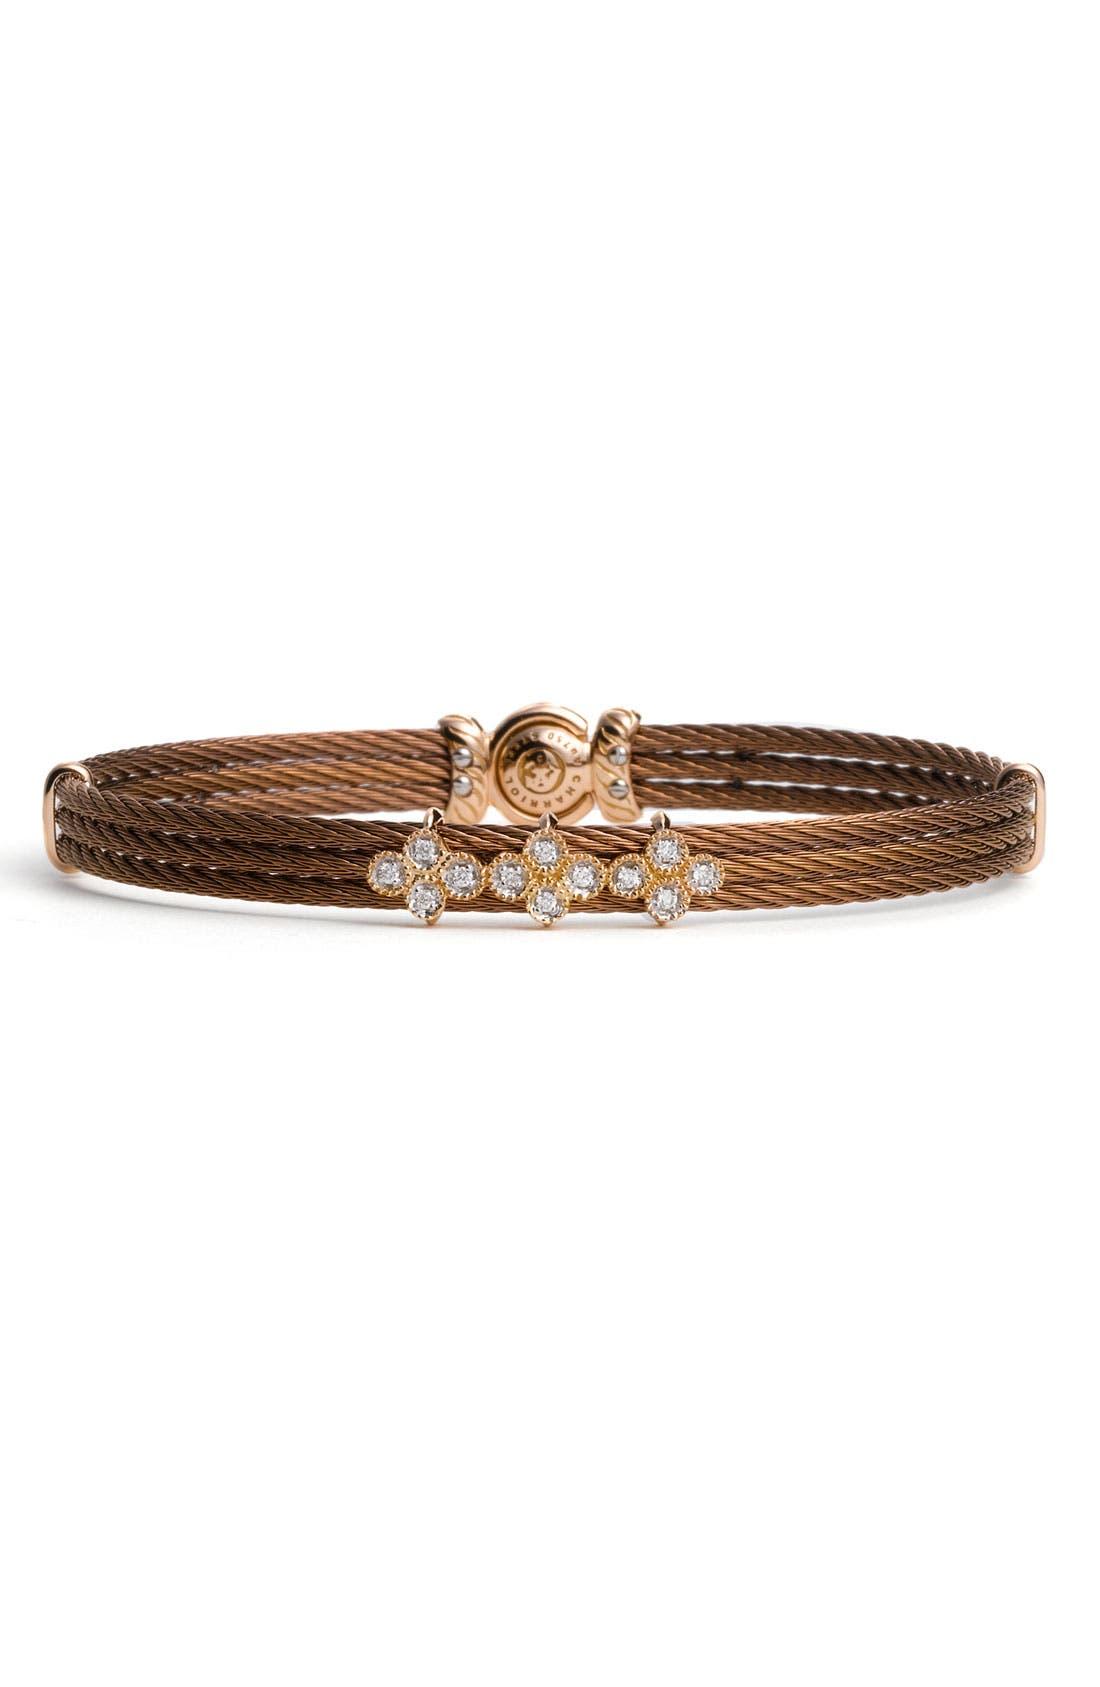 Alternate Image 1 Selected - ALOR® Gold, Diamond & Bronze Bracelet